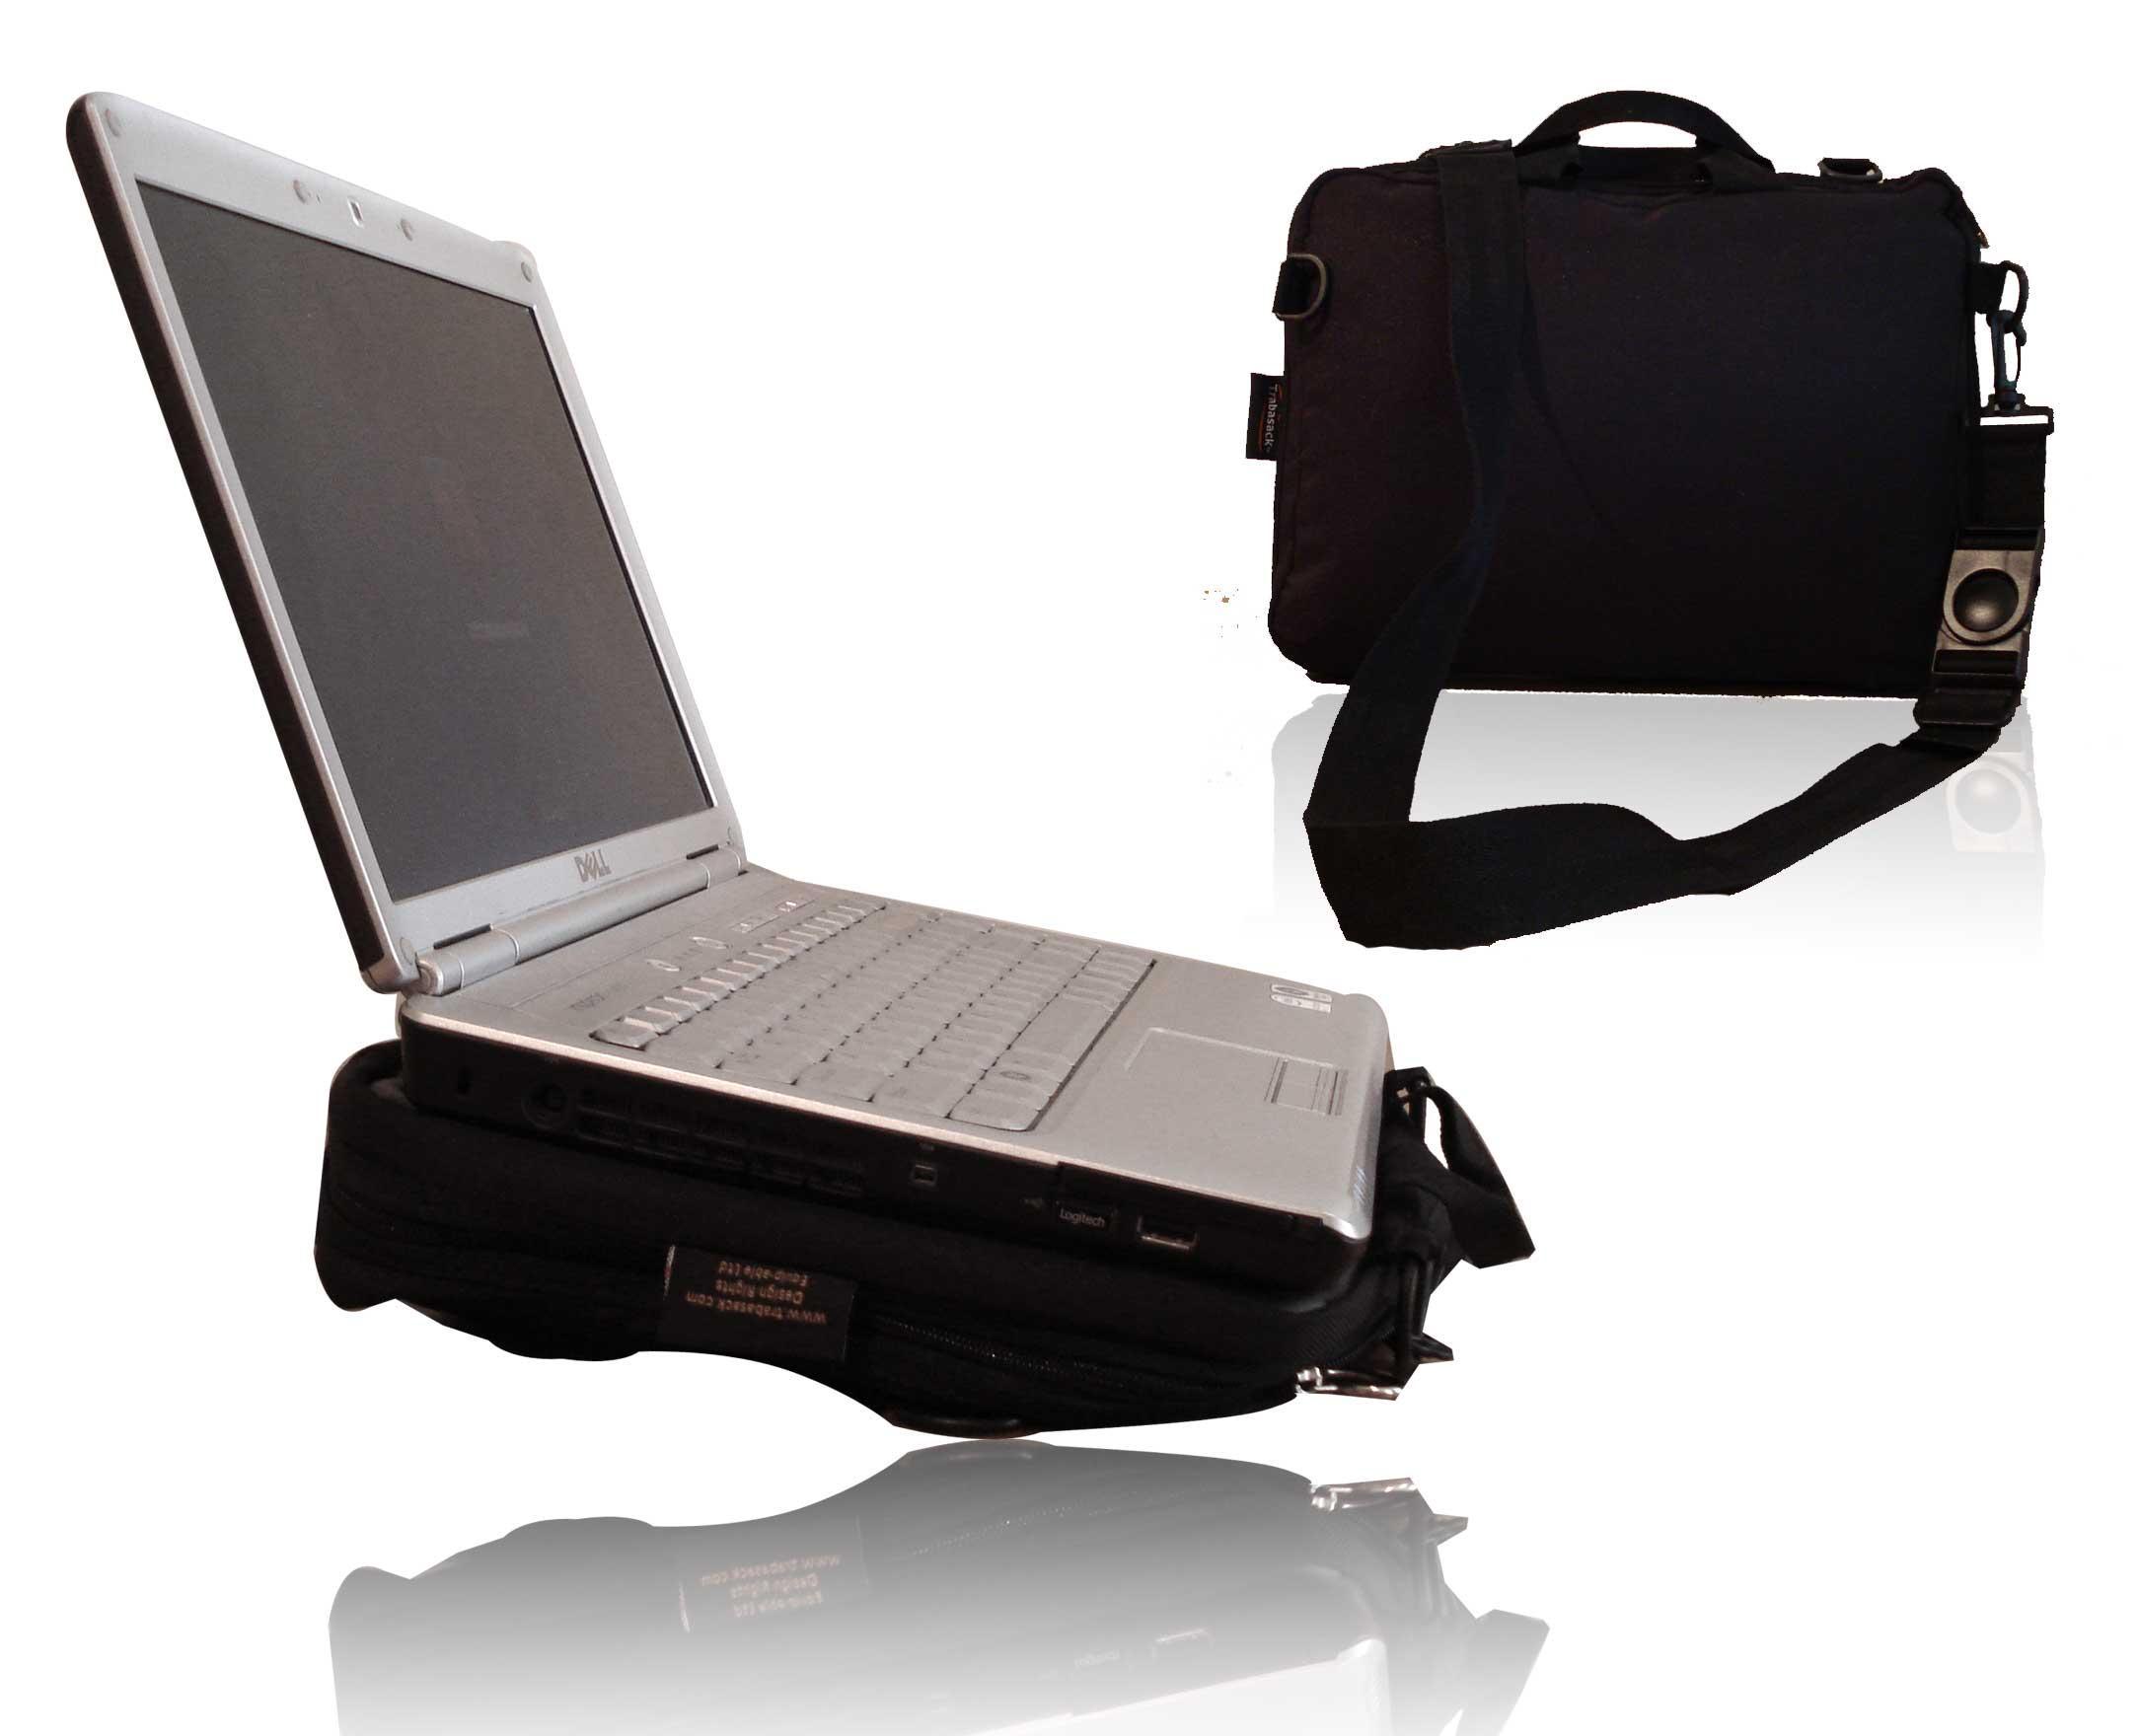 Mini Trabasack Lap Desk And Bag In One